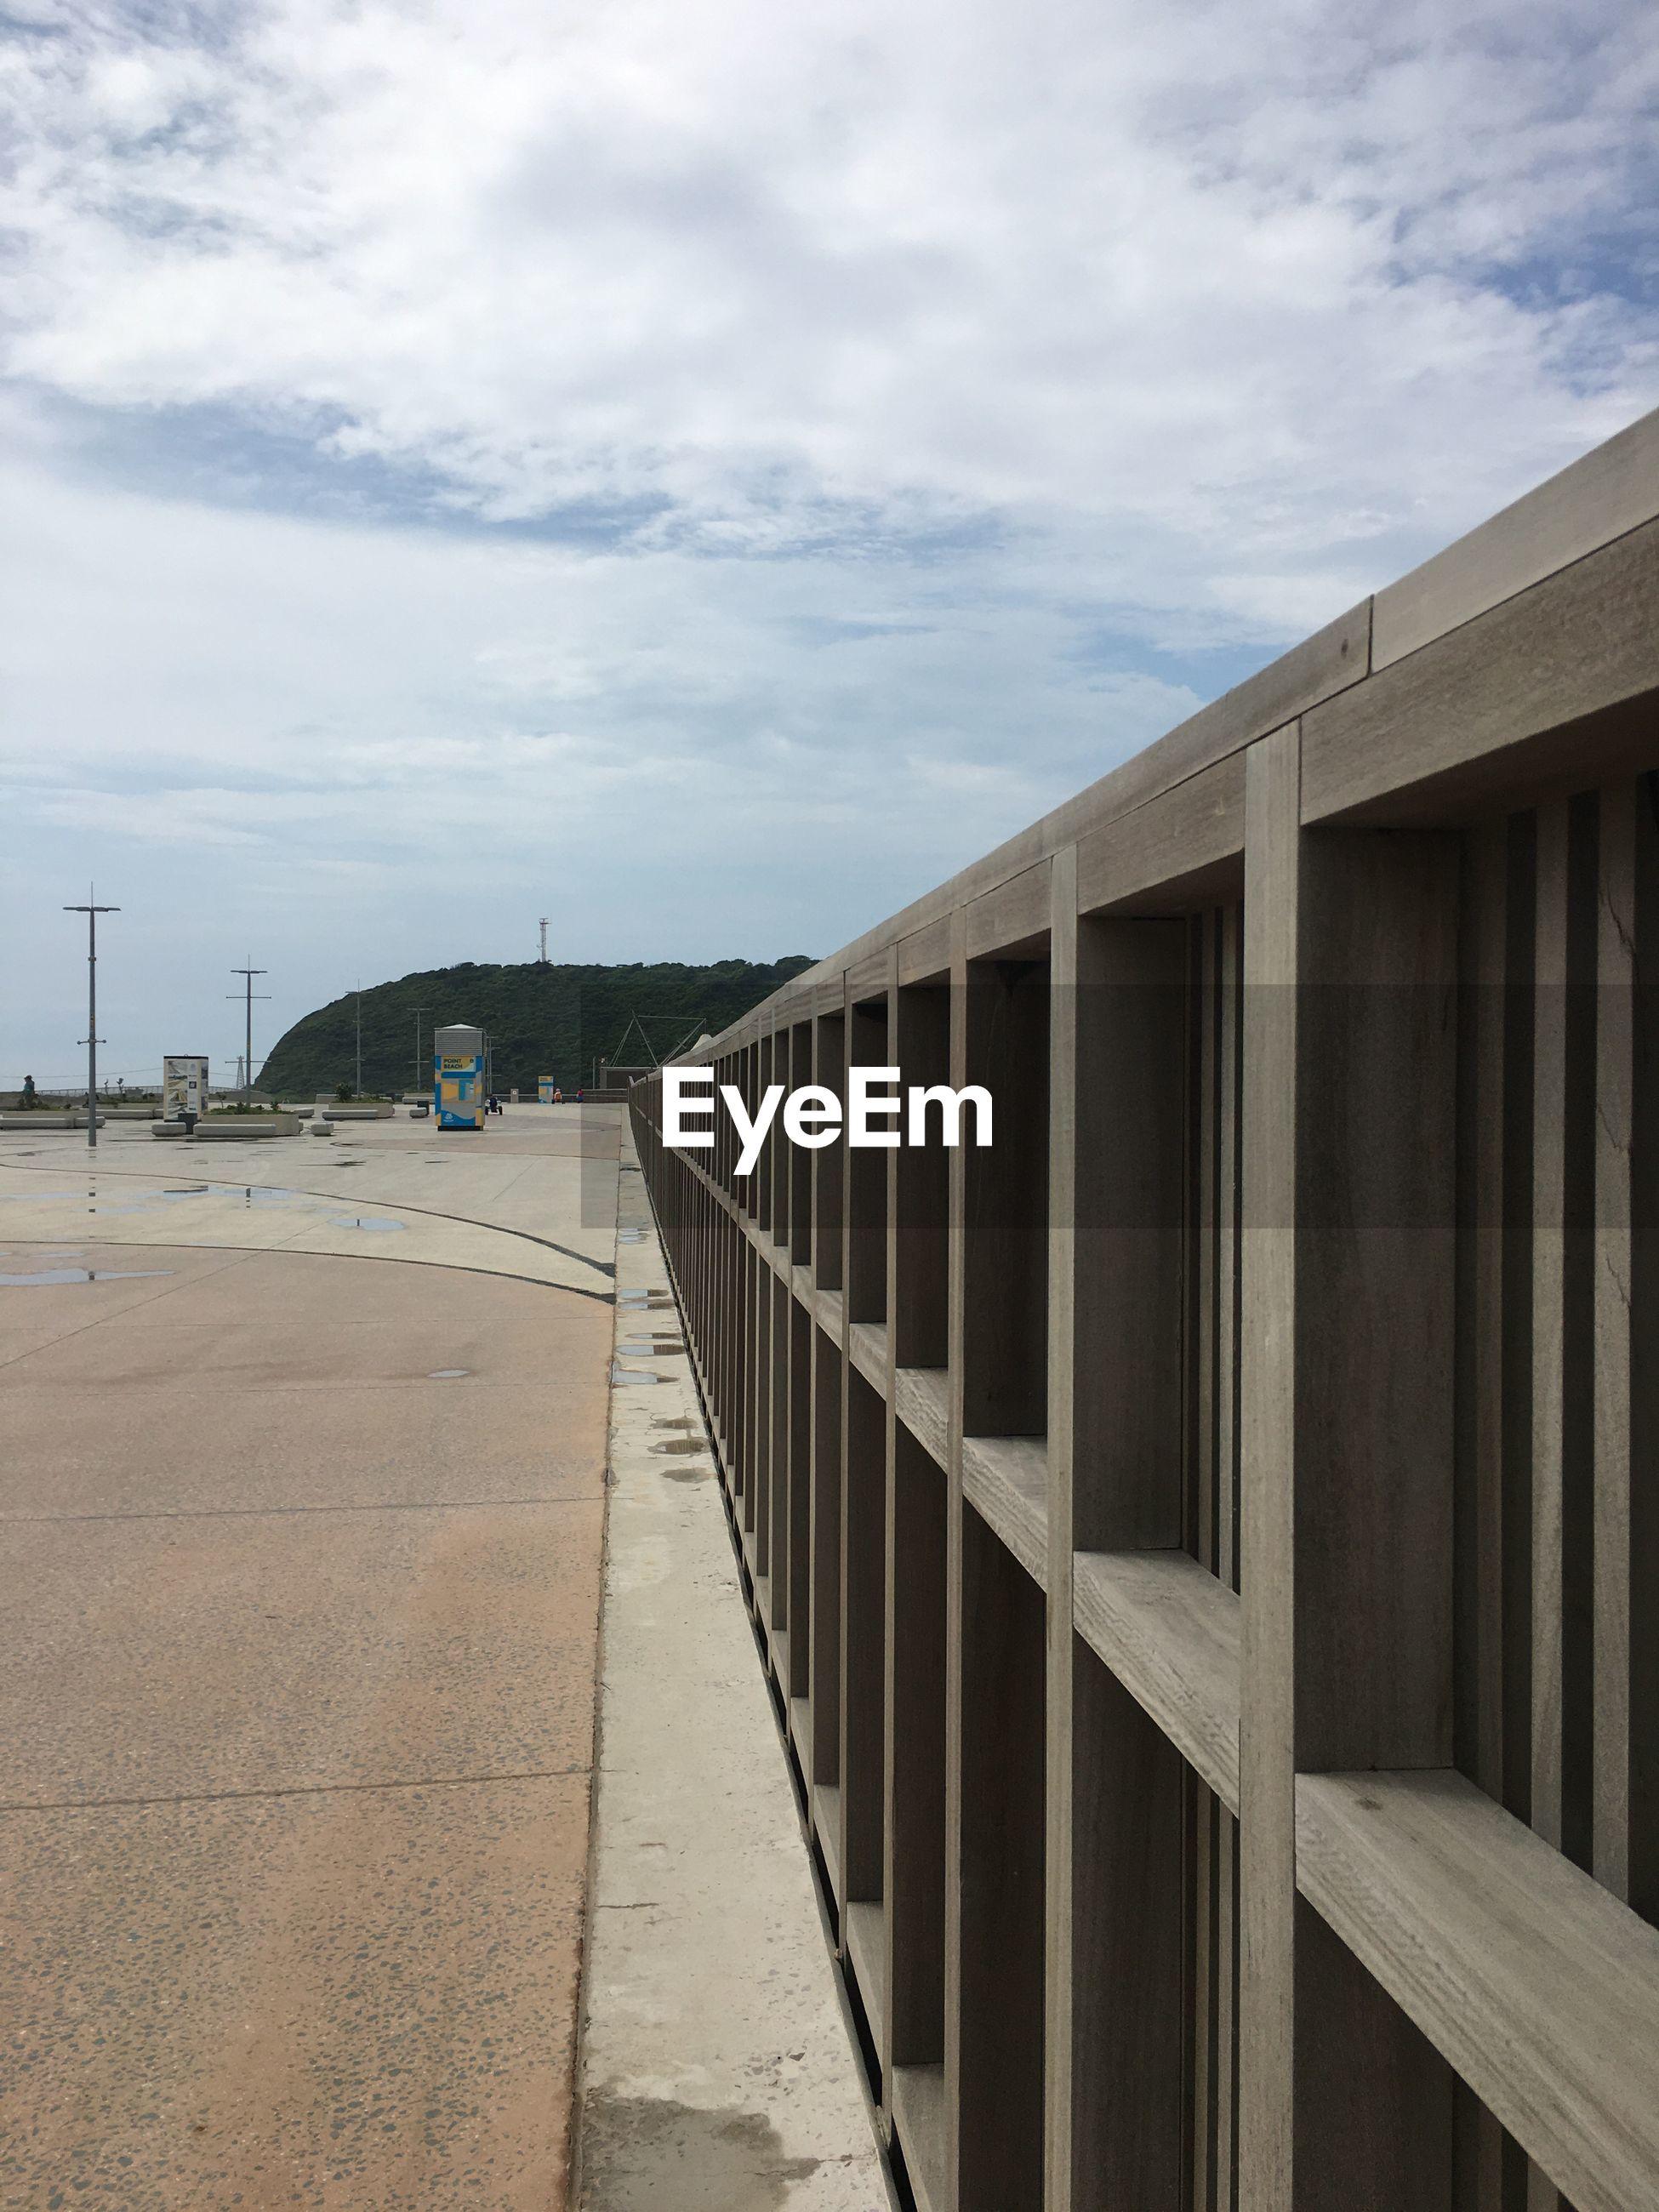 VIEW OF FOOTPATH AGAINST SKY